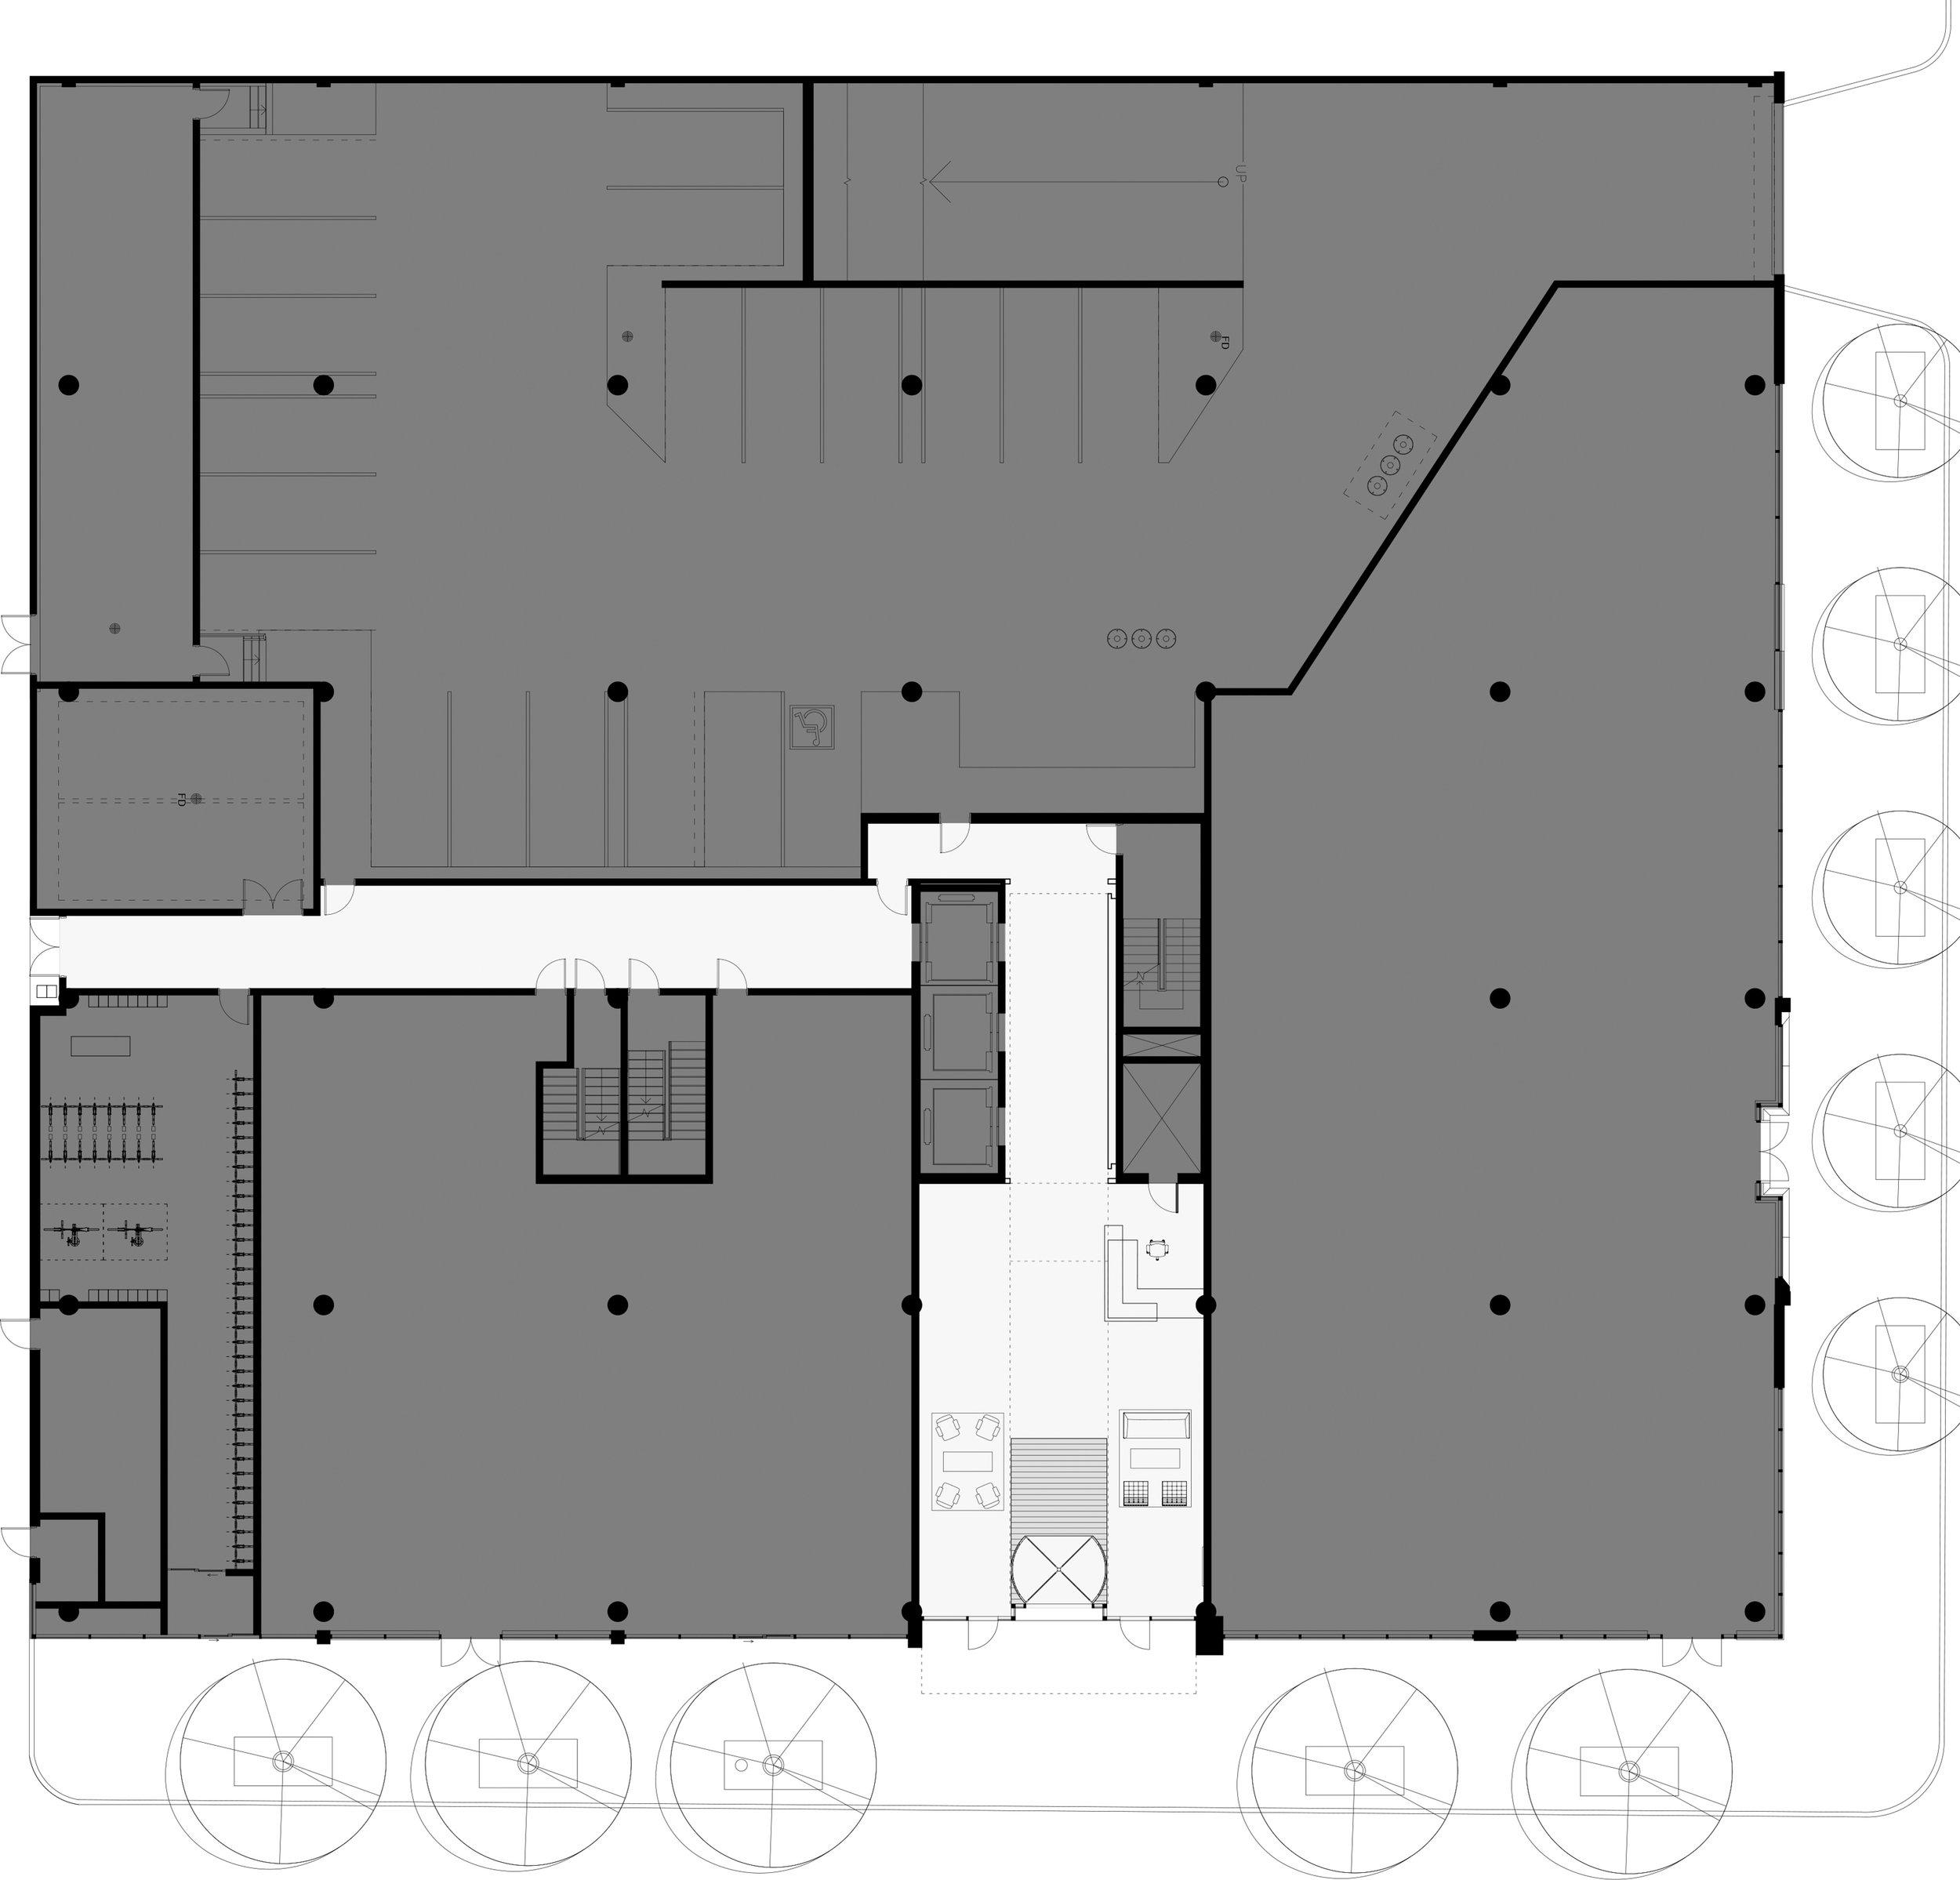 Lobby Plans 20180118.jpg